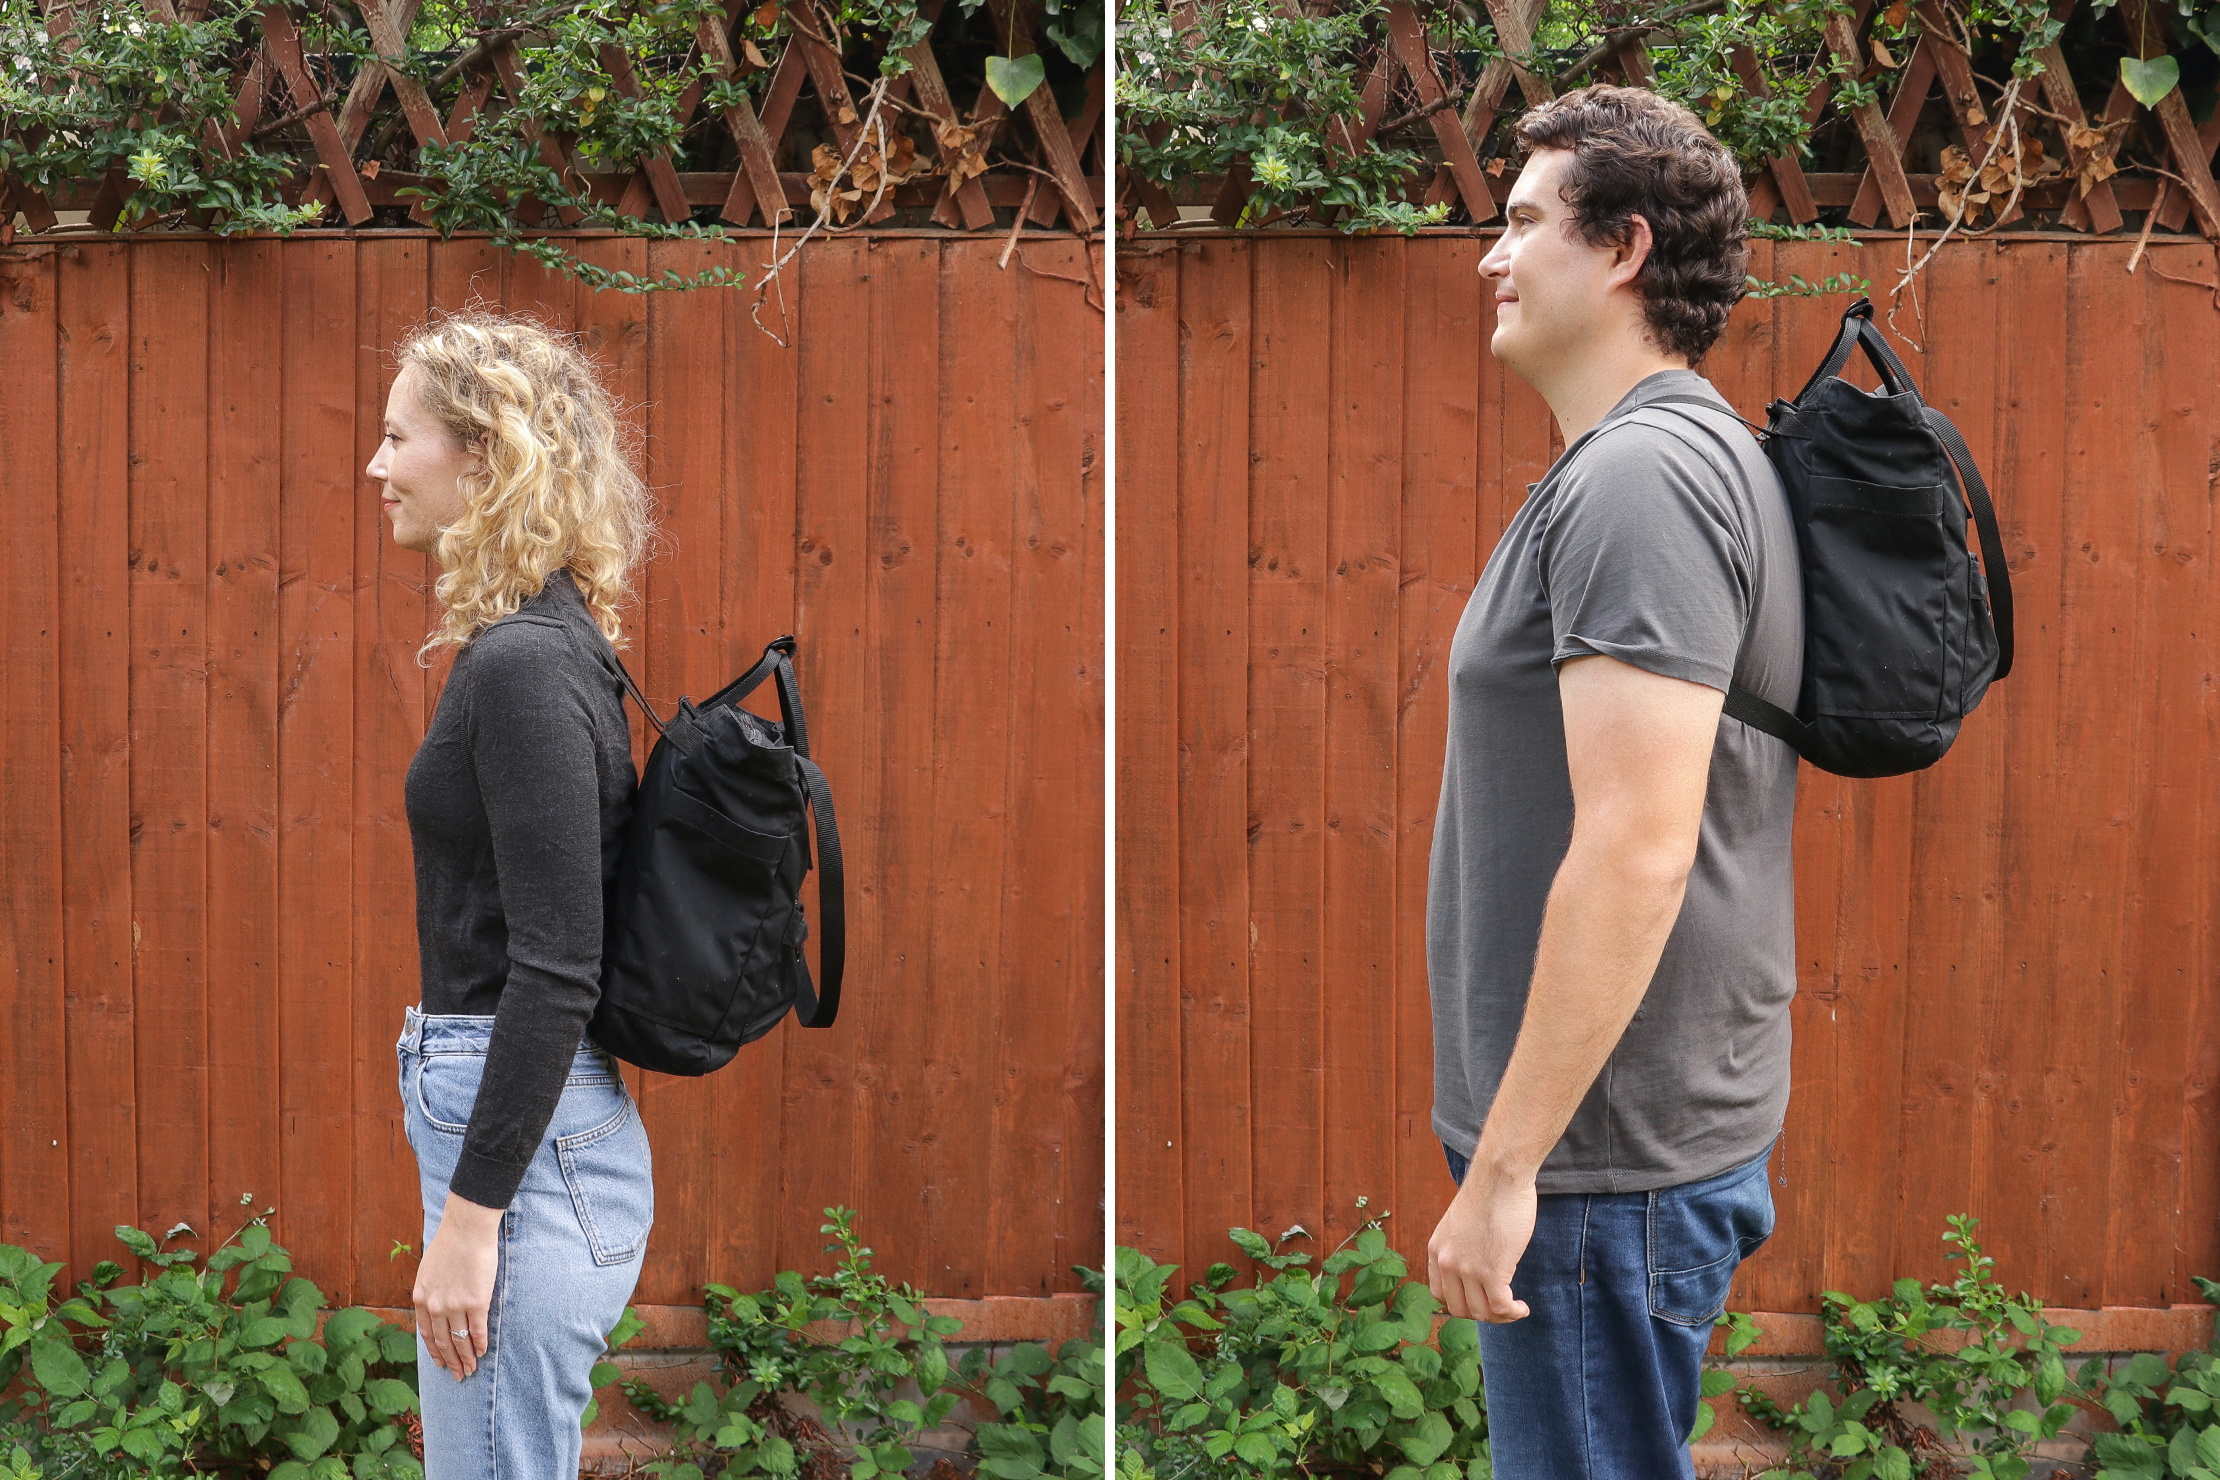 "Left: Rebecca, Height: 5'7"" (170 cm), Torso: 16 in (40 cm) | Right: Nathan, Height: 6'4"" (193 cm), Torso: 19"" (48 cm)"